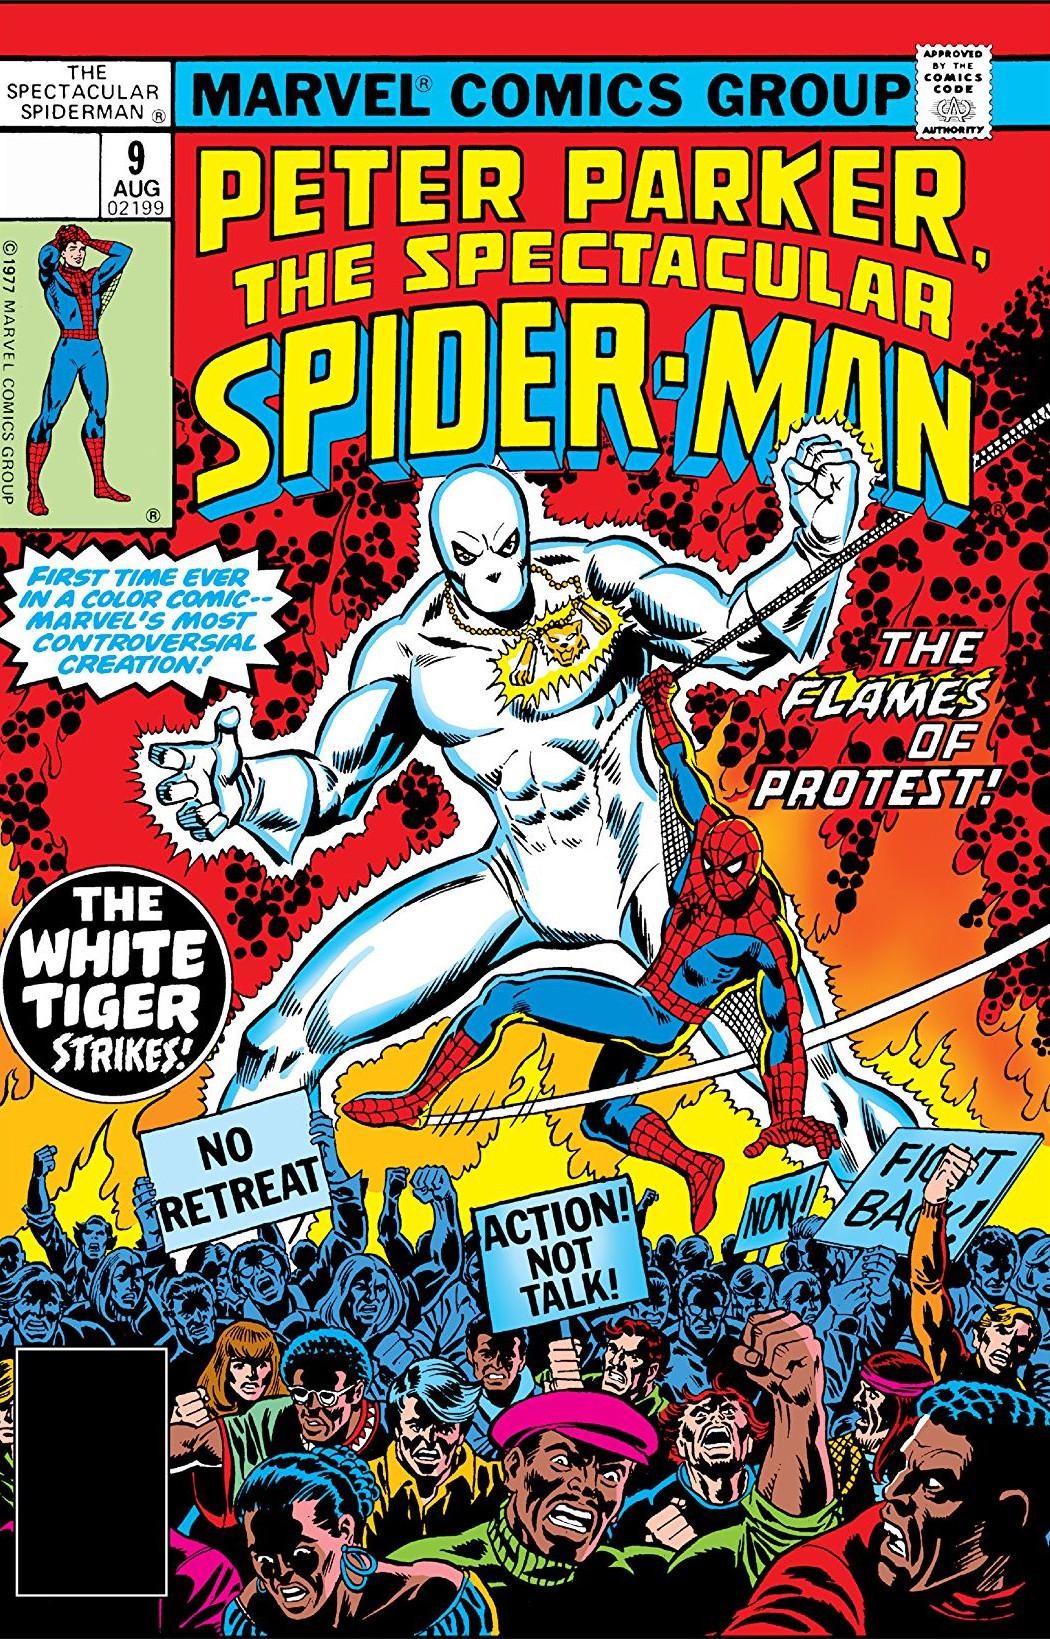 Peter Parker, The Spectacular Spider-Man Vol 1 9